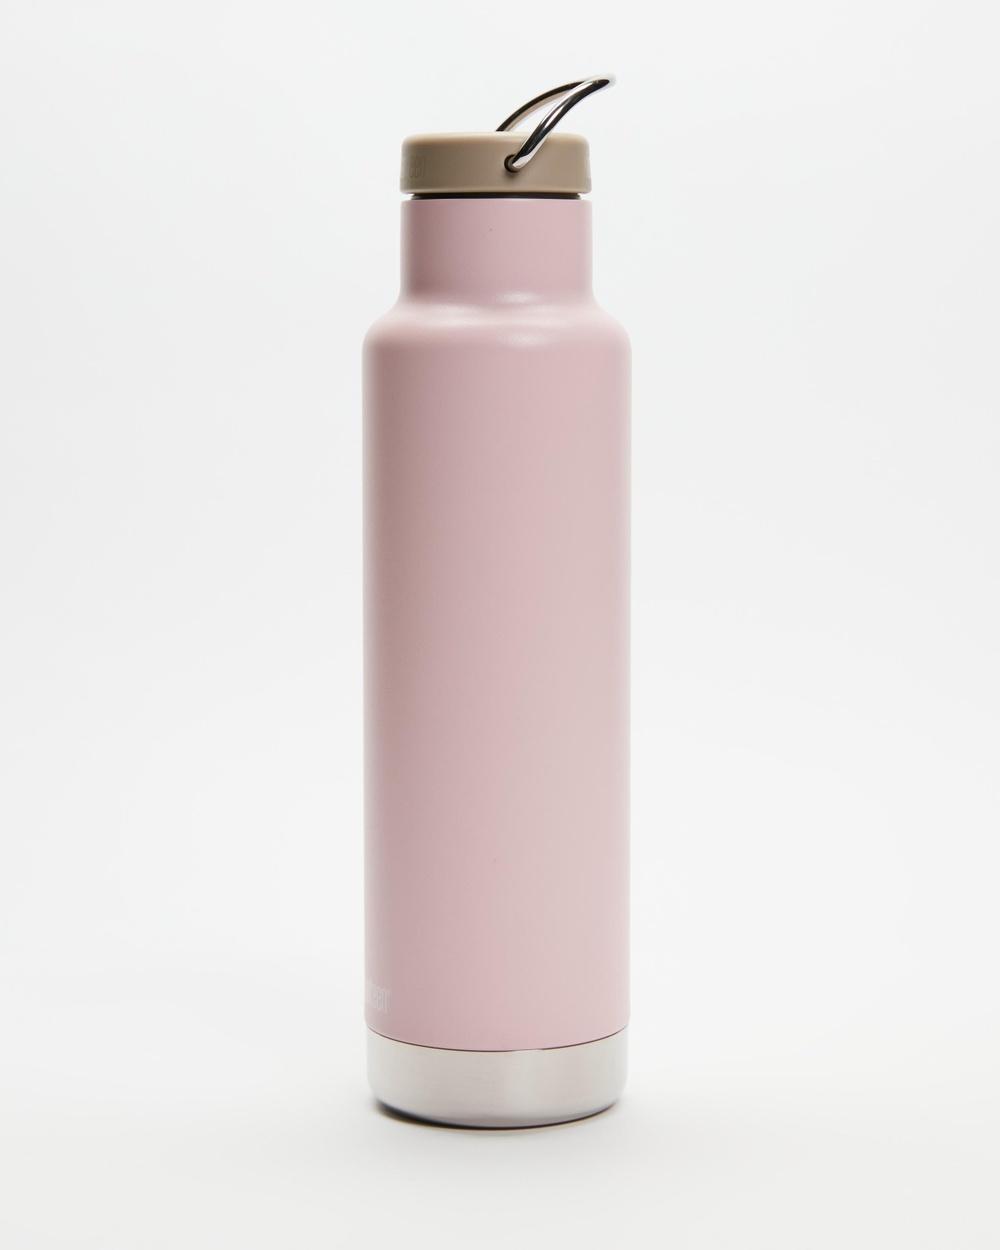 Klean Kanteen 20oz Insulated Classic Loop Cap Bottle Water Bottles Lotus